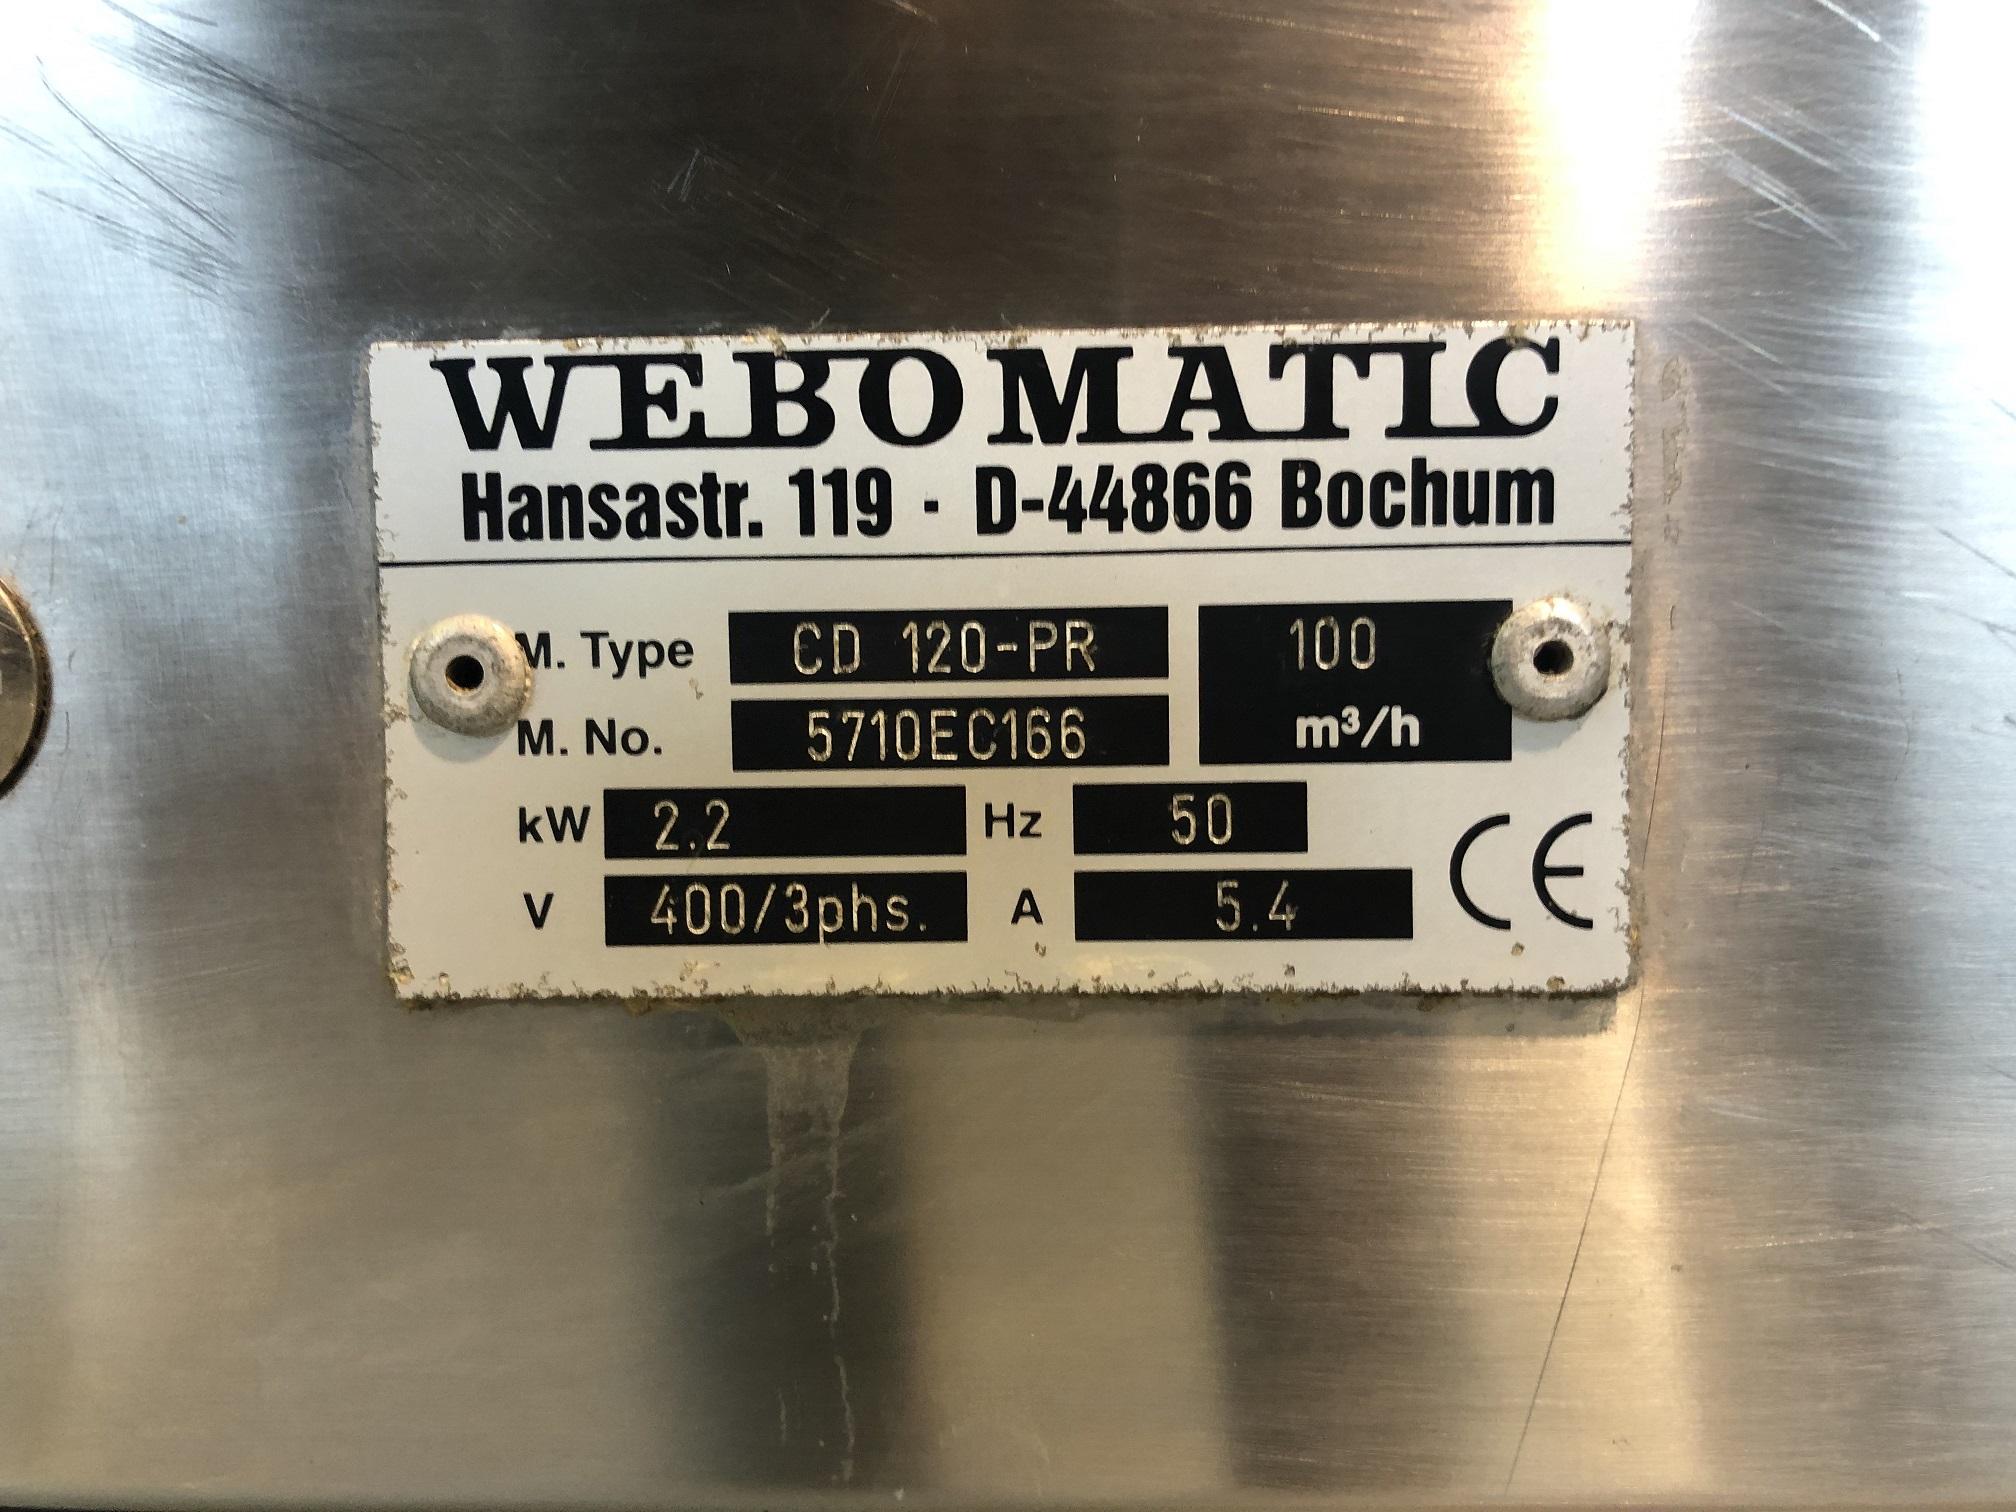 WEBOMATIC  CD120-PR